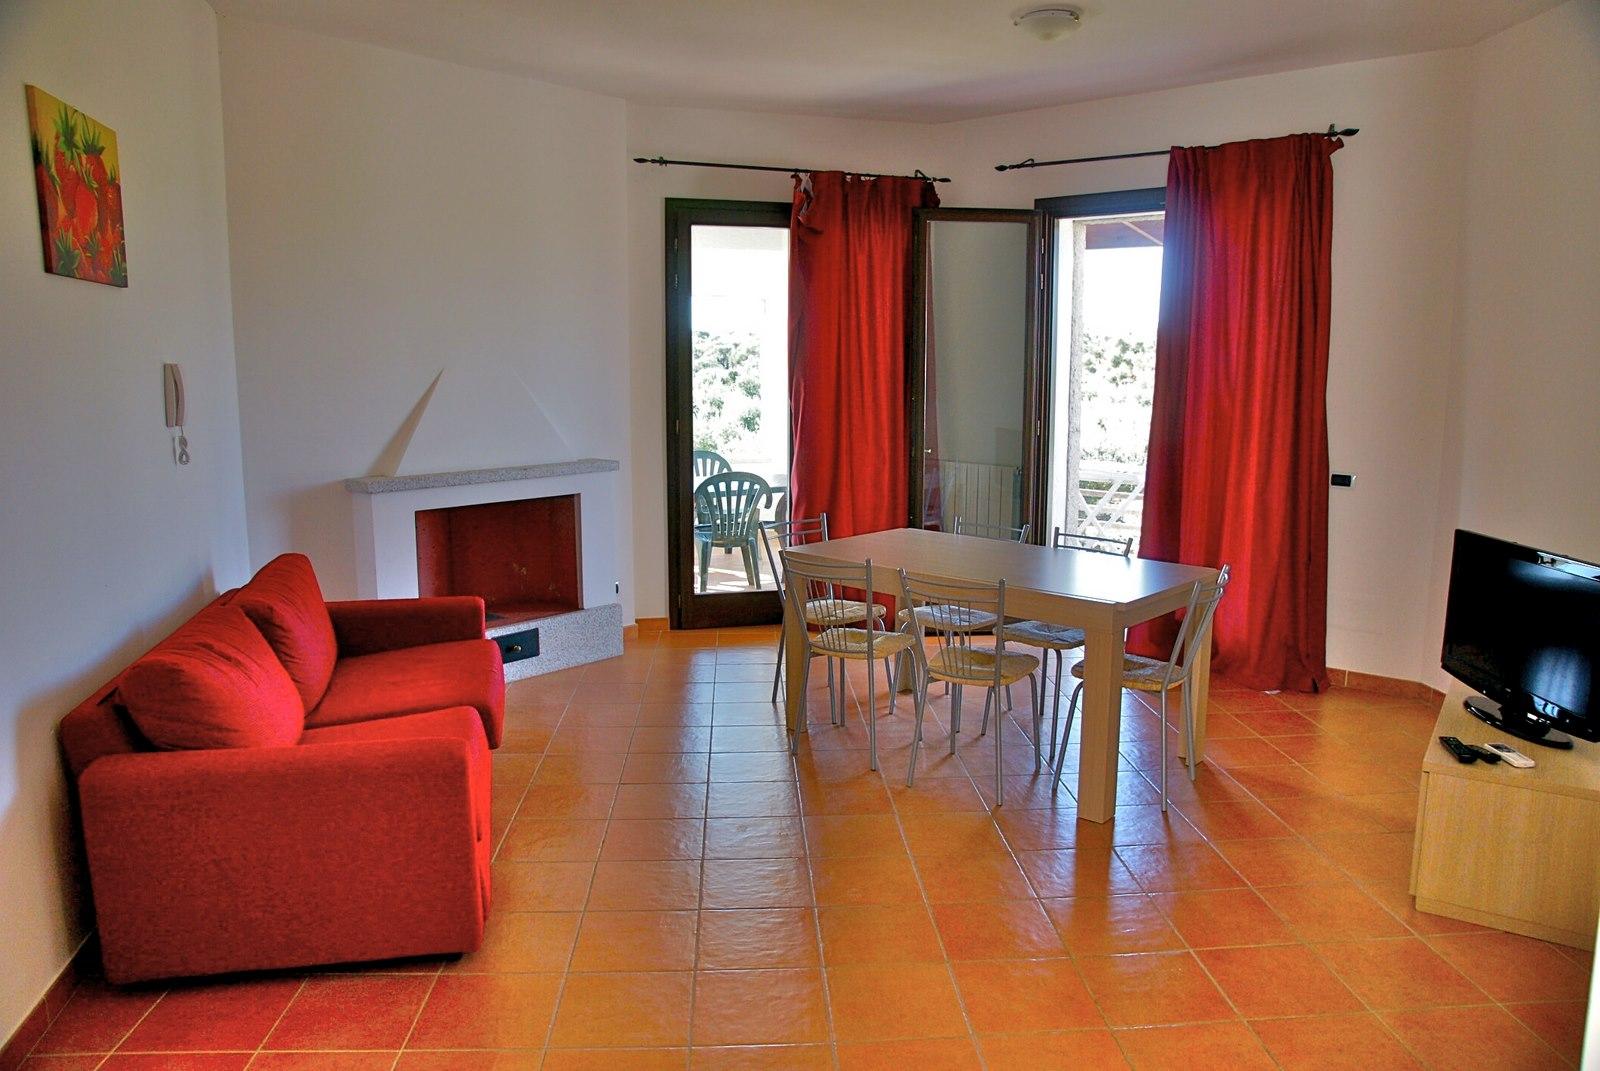 Ferienhaus Carru (877335), Sant Angelo Custode, Sassari, Sardinien, Italien, Bild 27